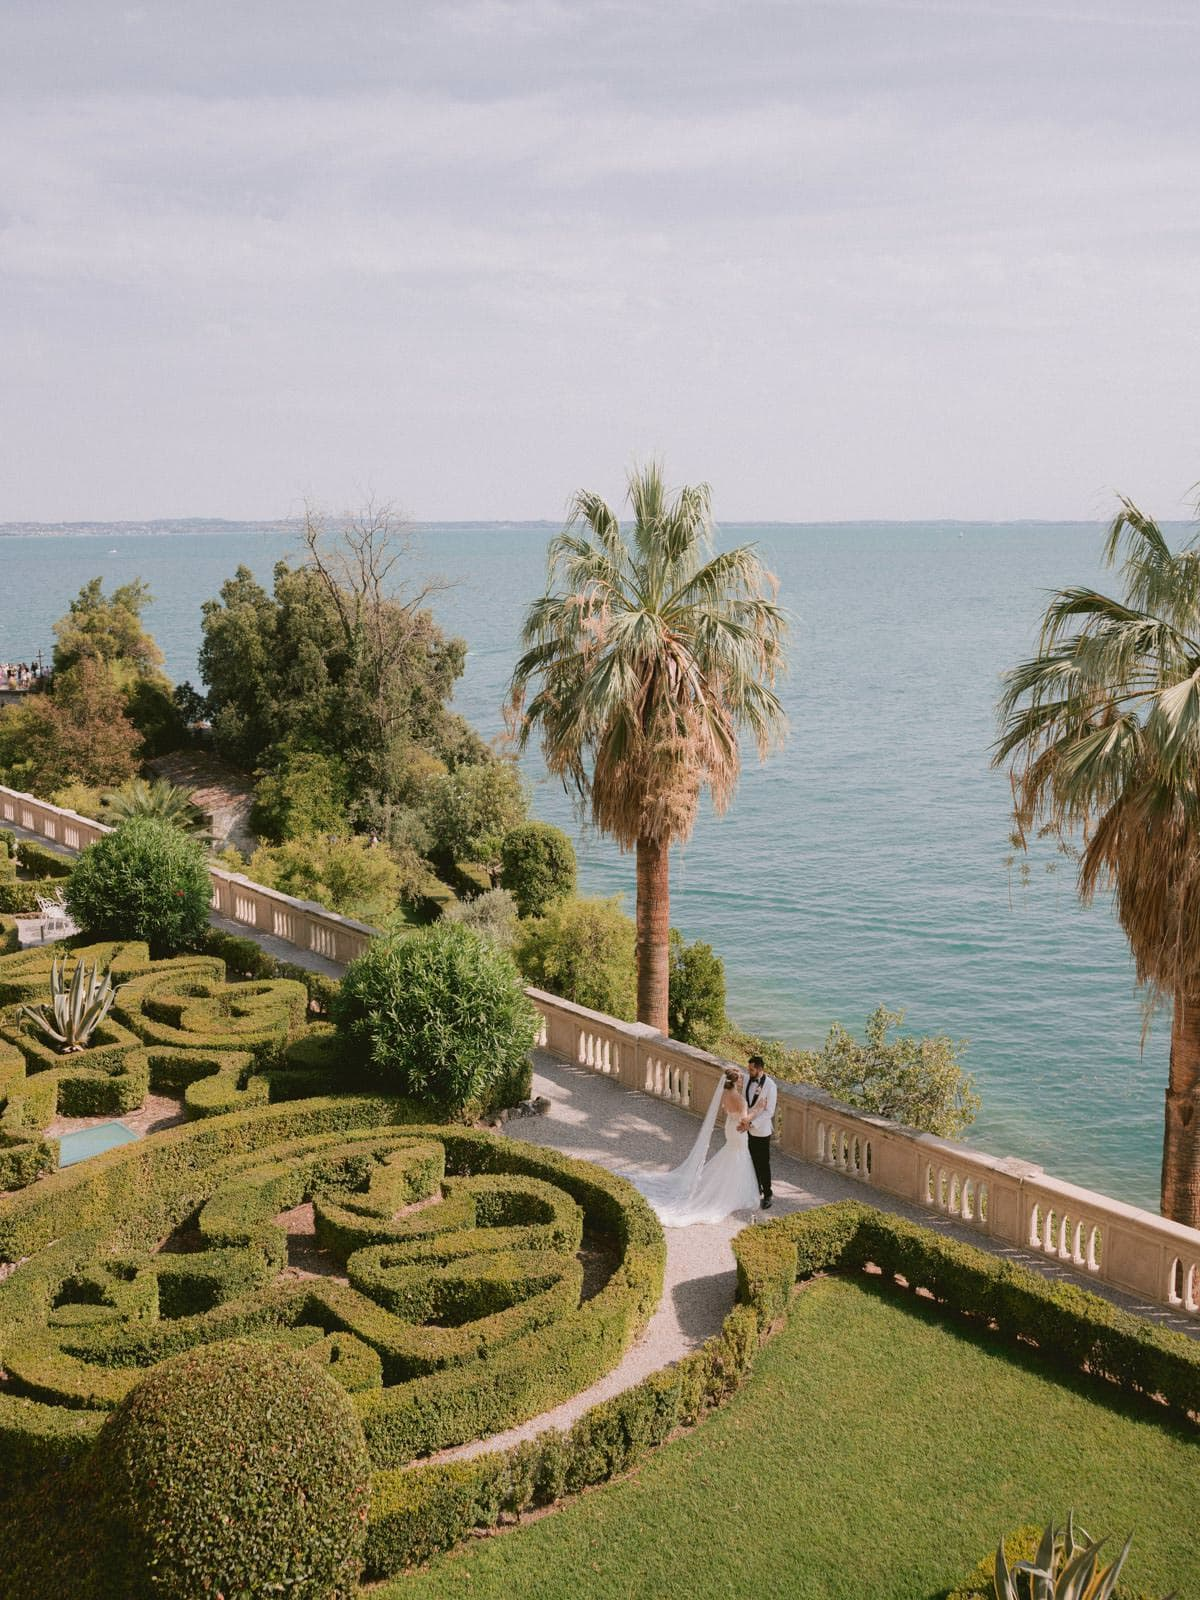 couple photo session in the Isola del garda's italian gardens